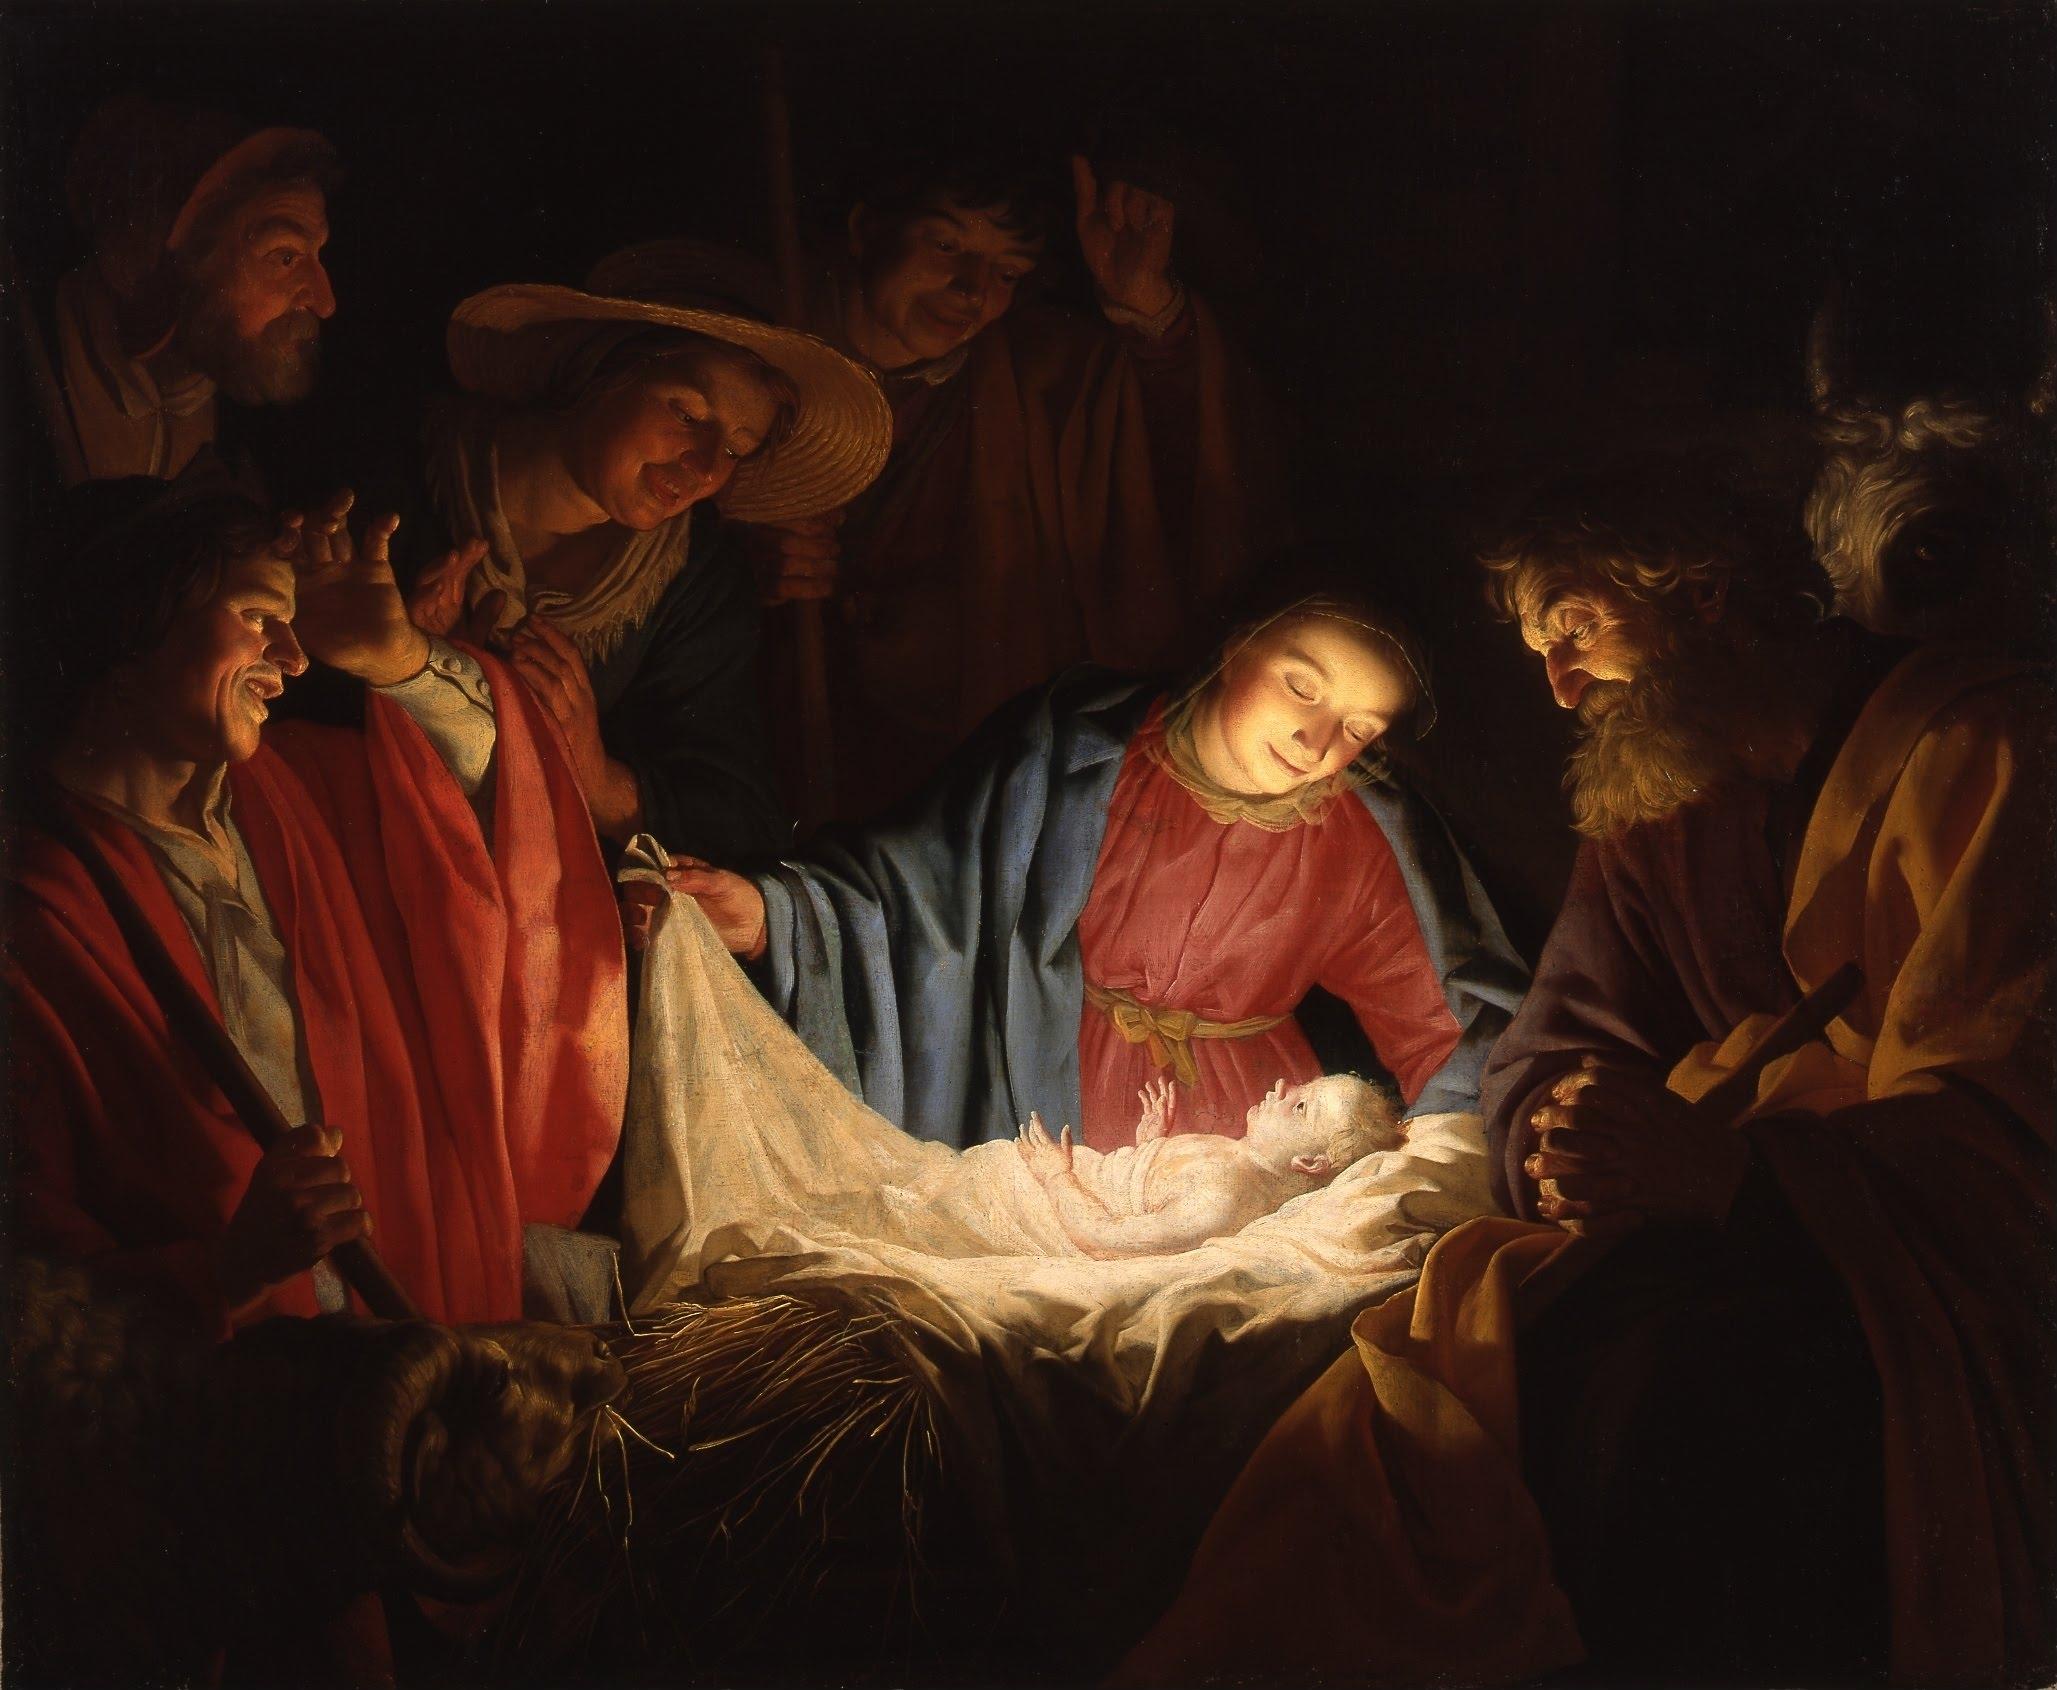 Gerard_van_Honthorst_-_Adoration_of_the_Shepherds_(1622).jpg